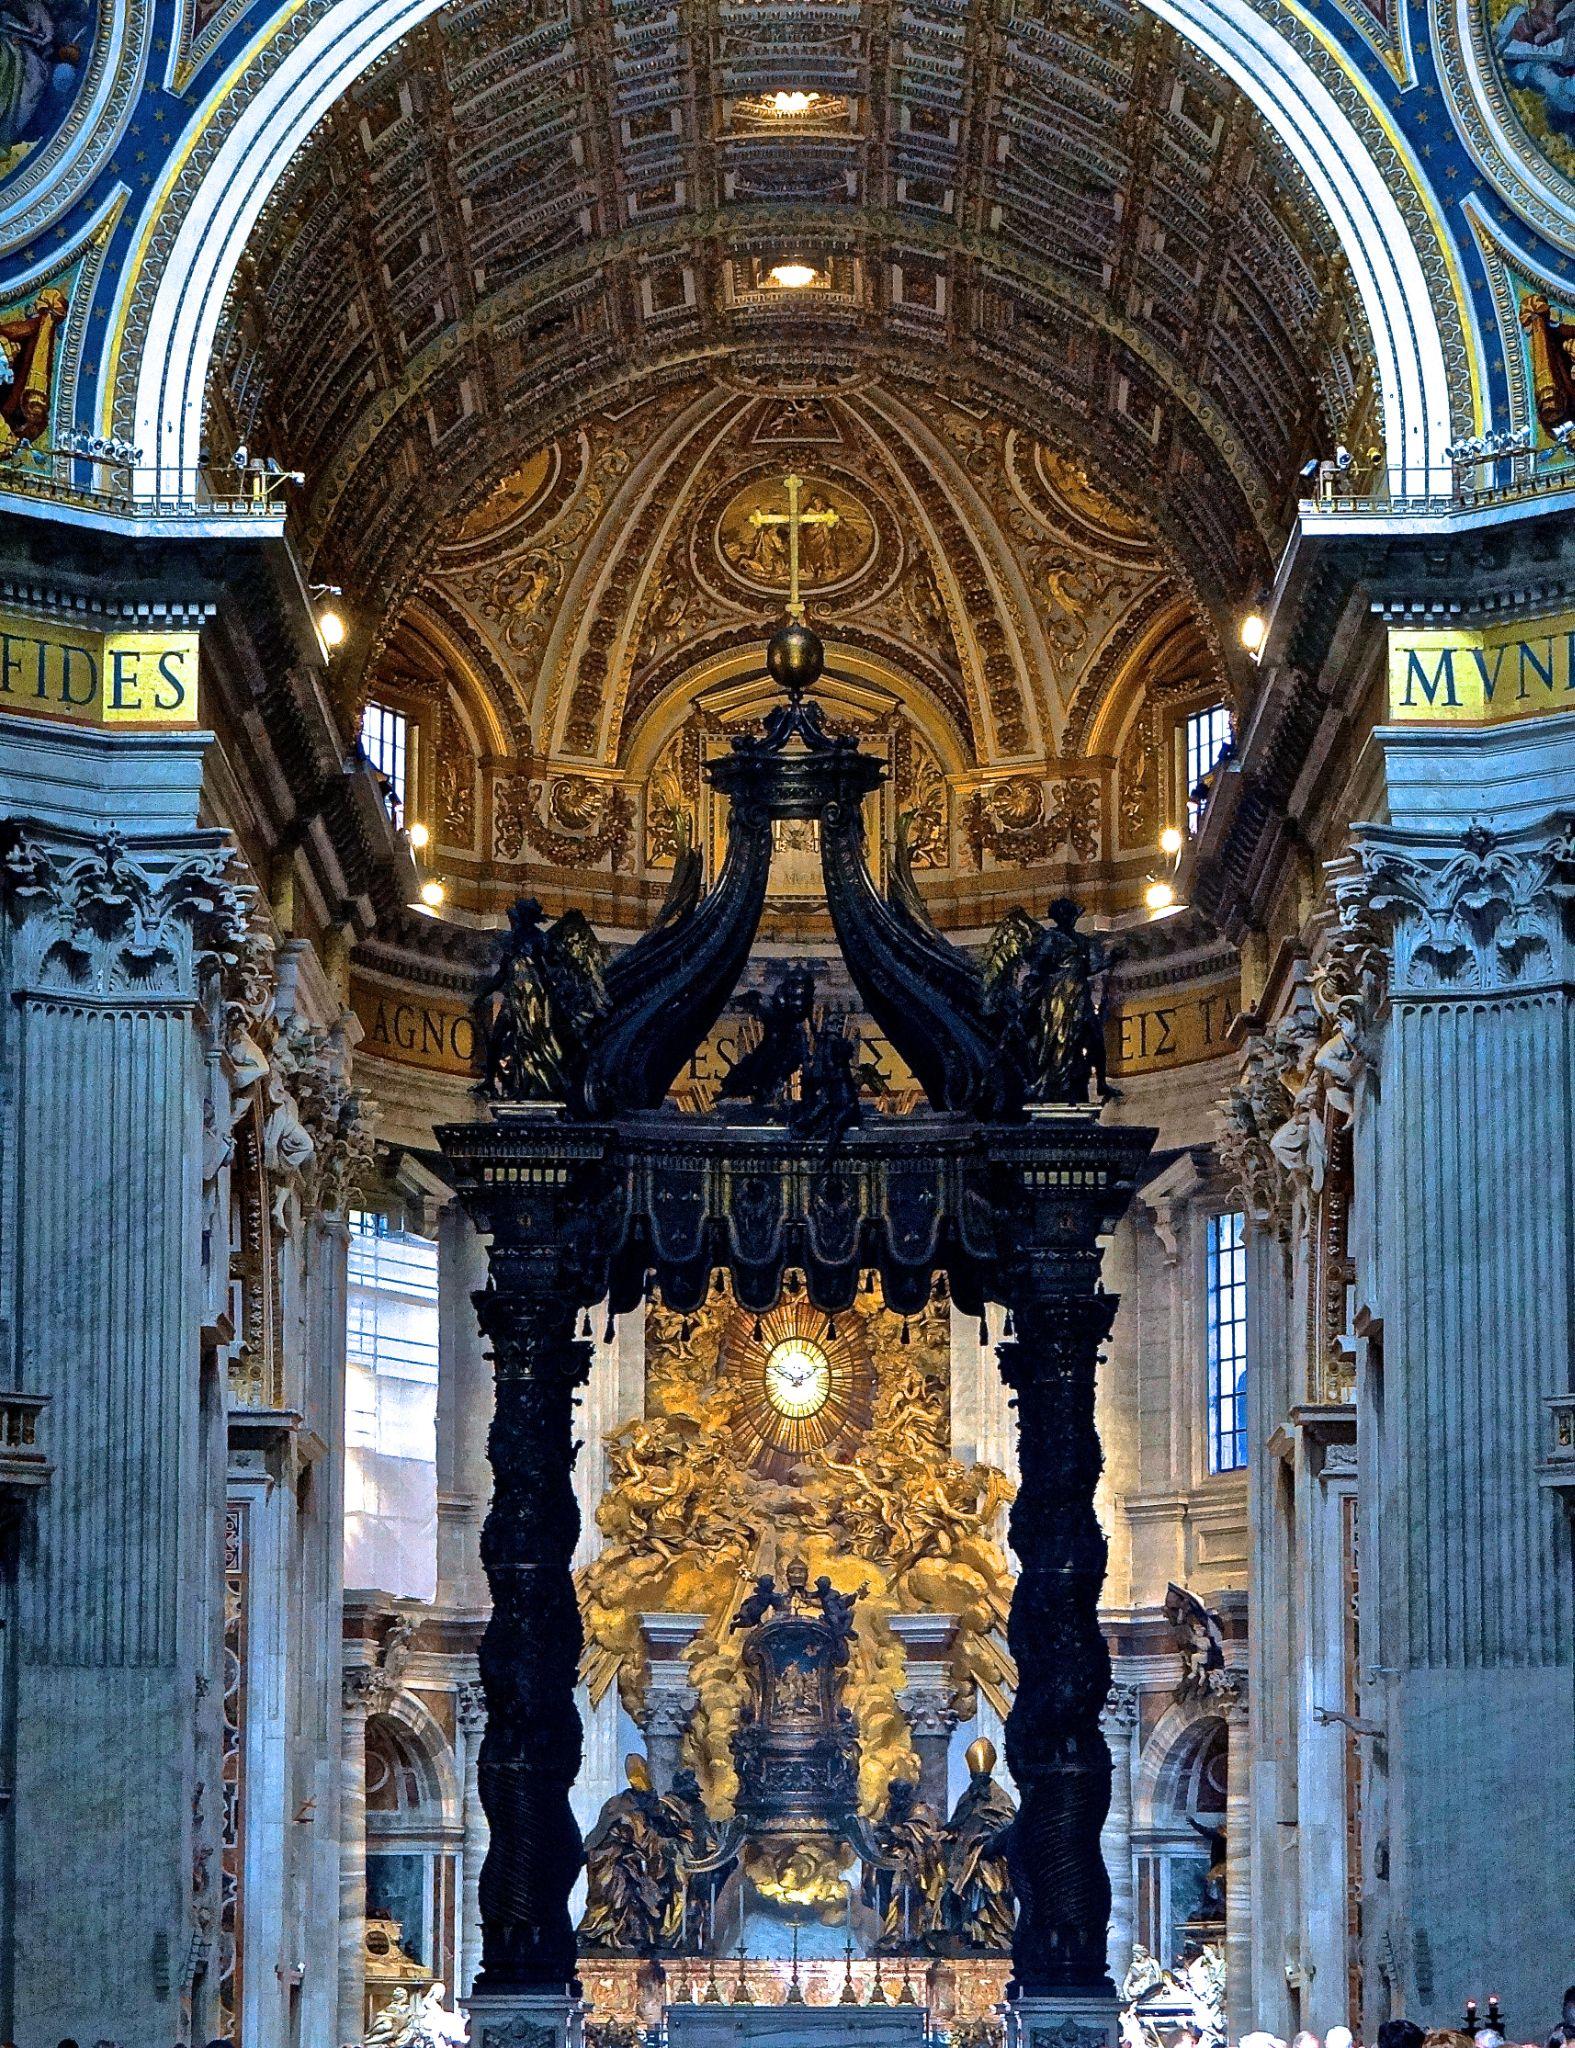 St. Peter's Altar - Vatican by Steve Aicinena